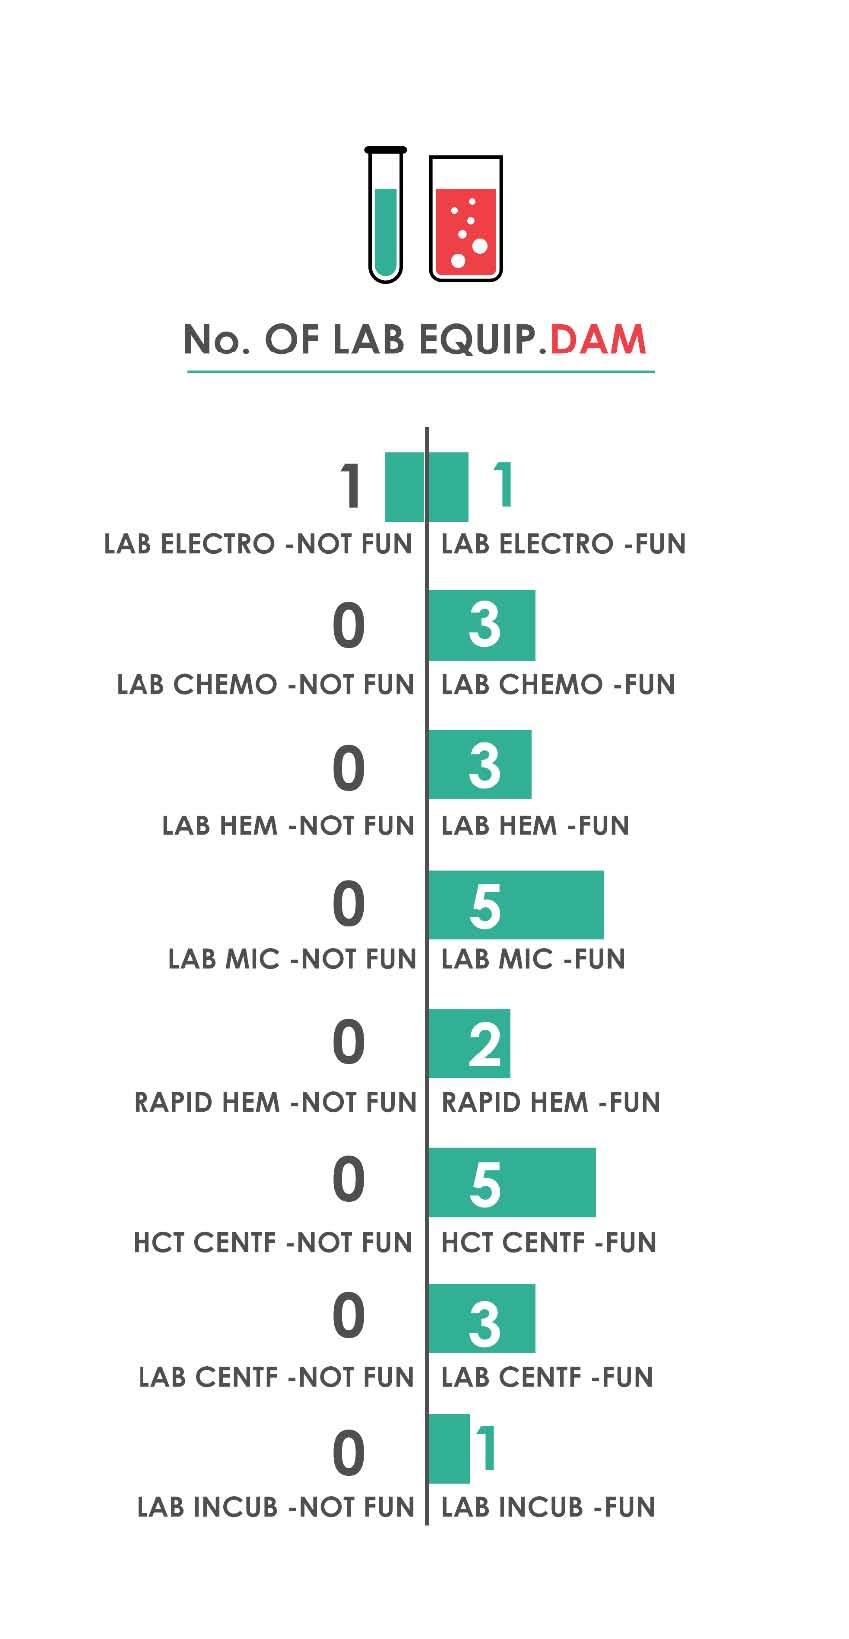 Fig._36.1_Number_of_Laboratory_Equipment__Damascus.jpg